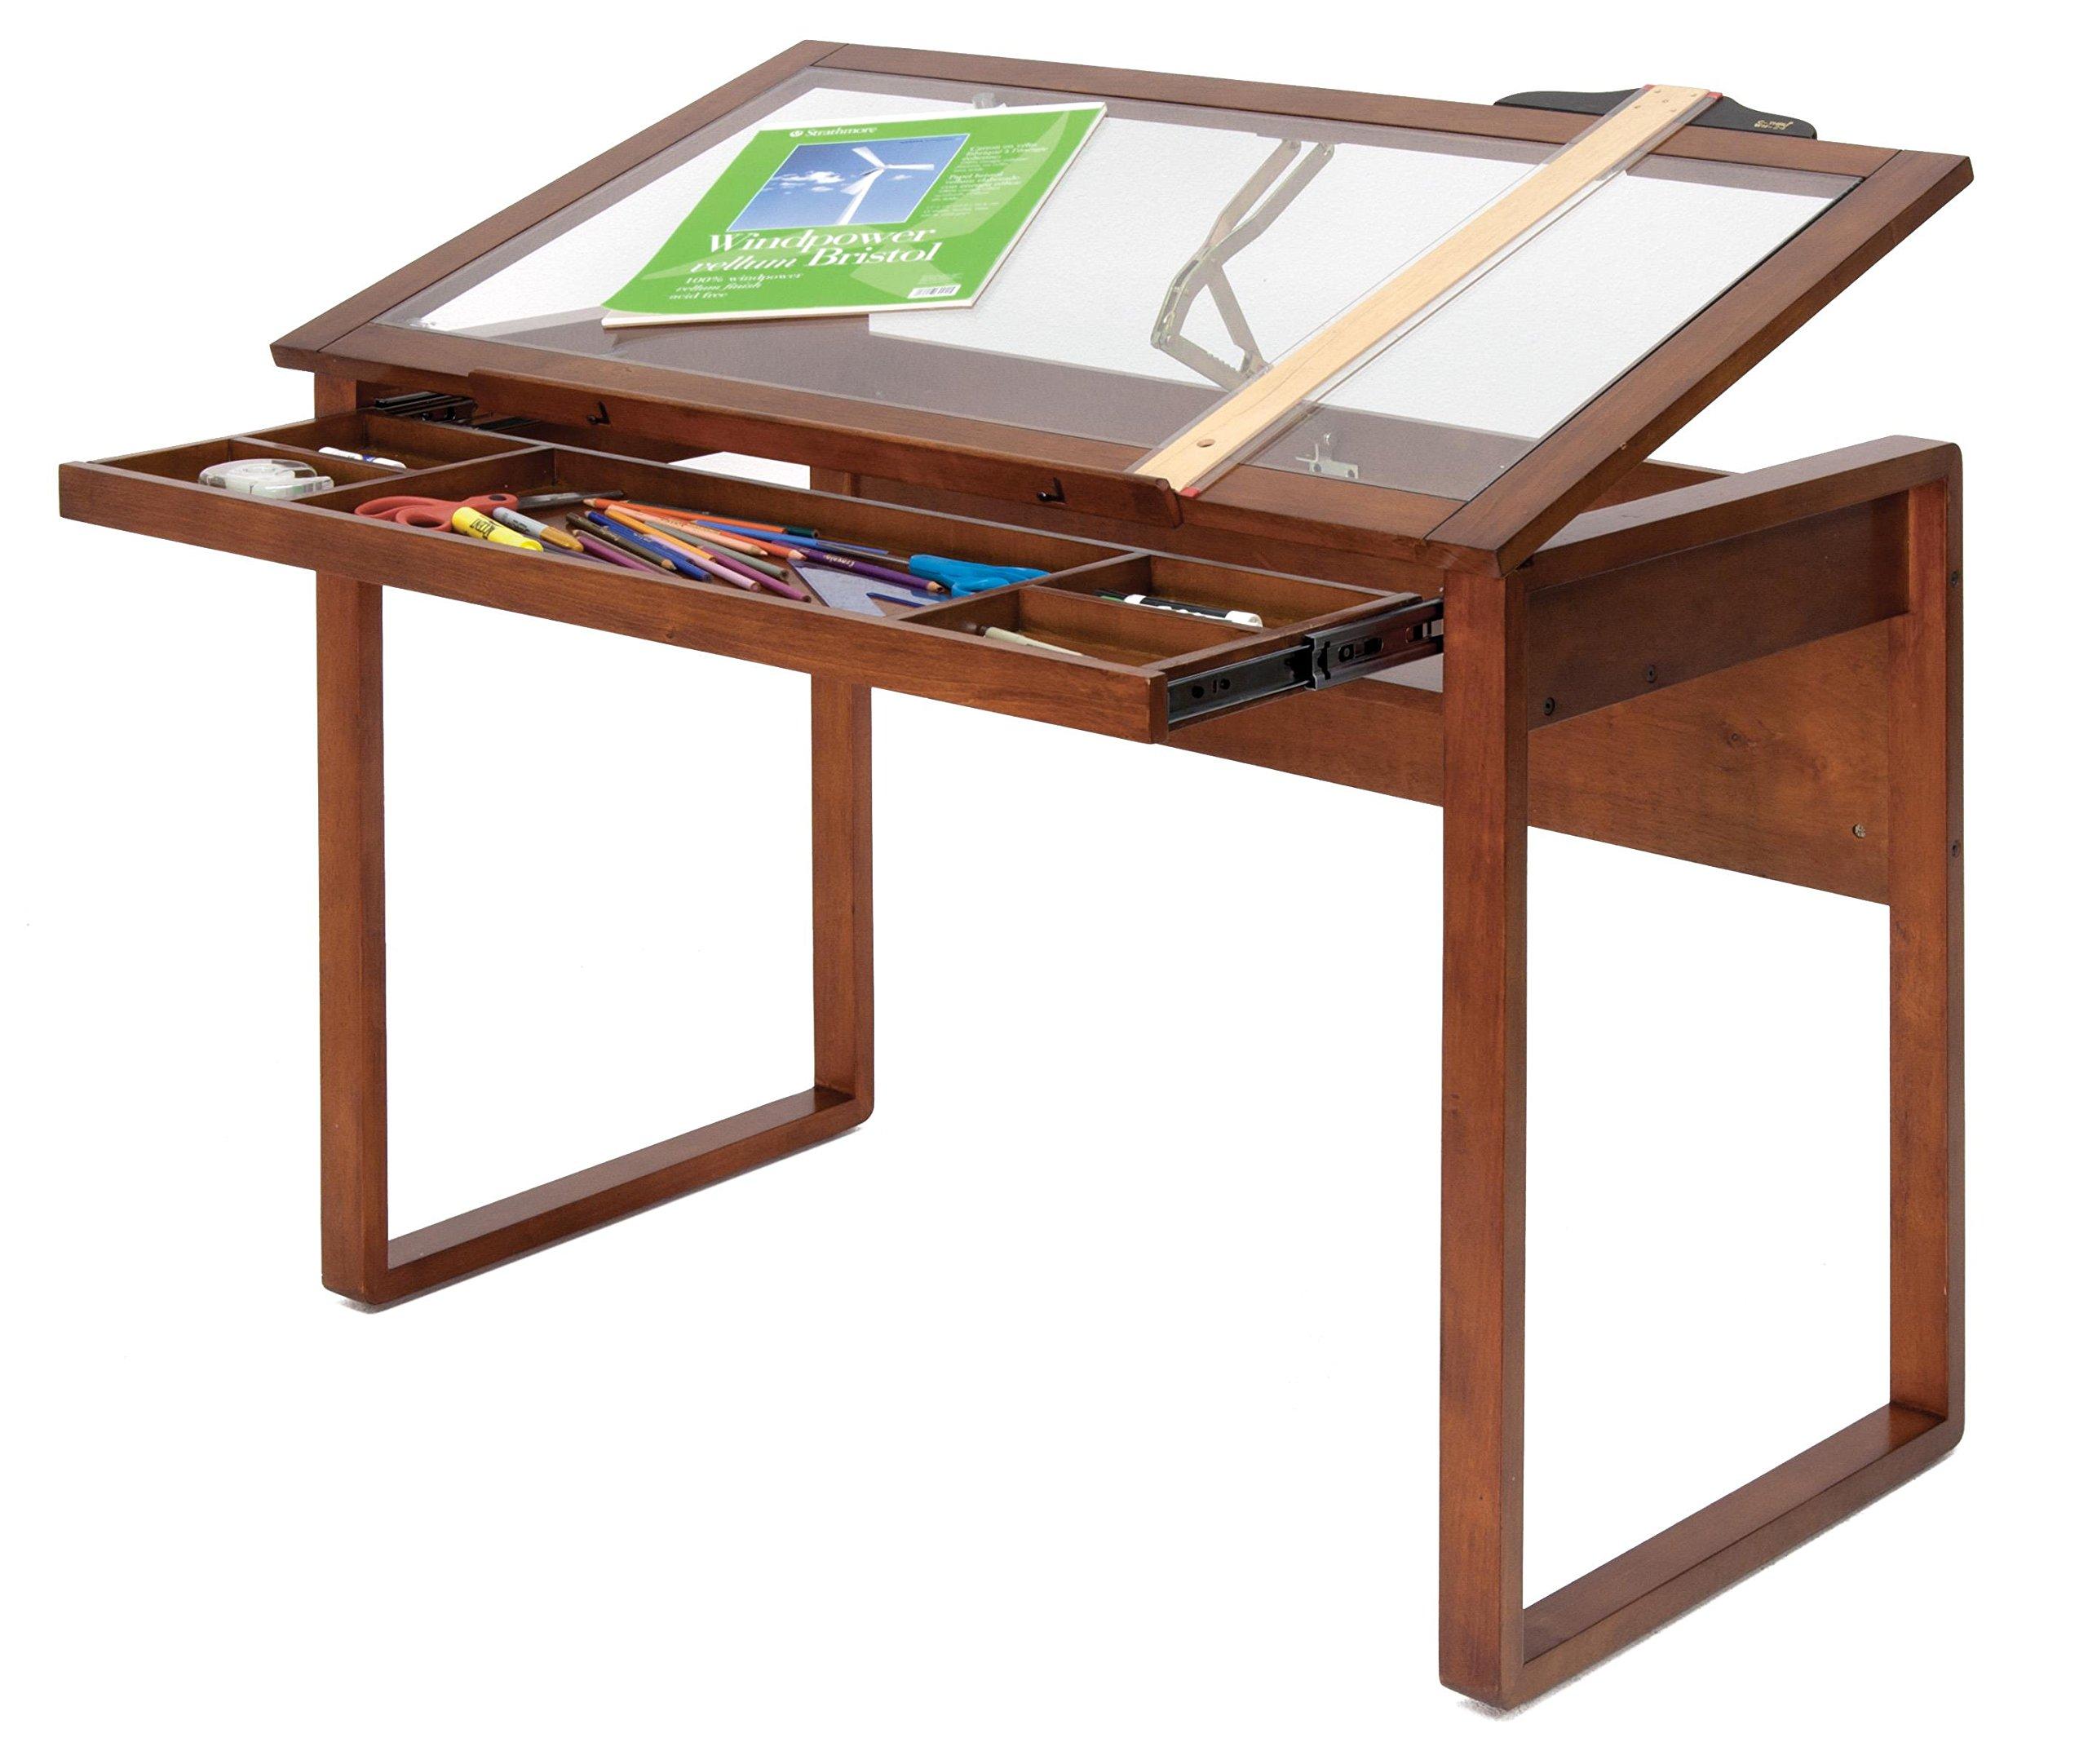 Studio Designs Ponderosa Table Glass Top by STUDIO DESIGNS INSPIRING CREATIVITY WWW.STUDIODESIGNS.COM